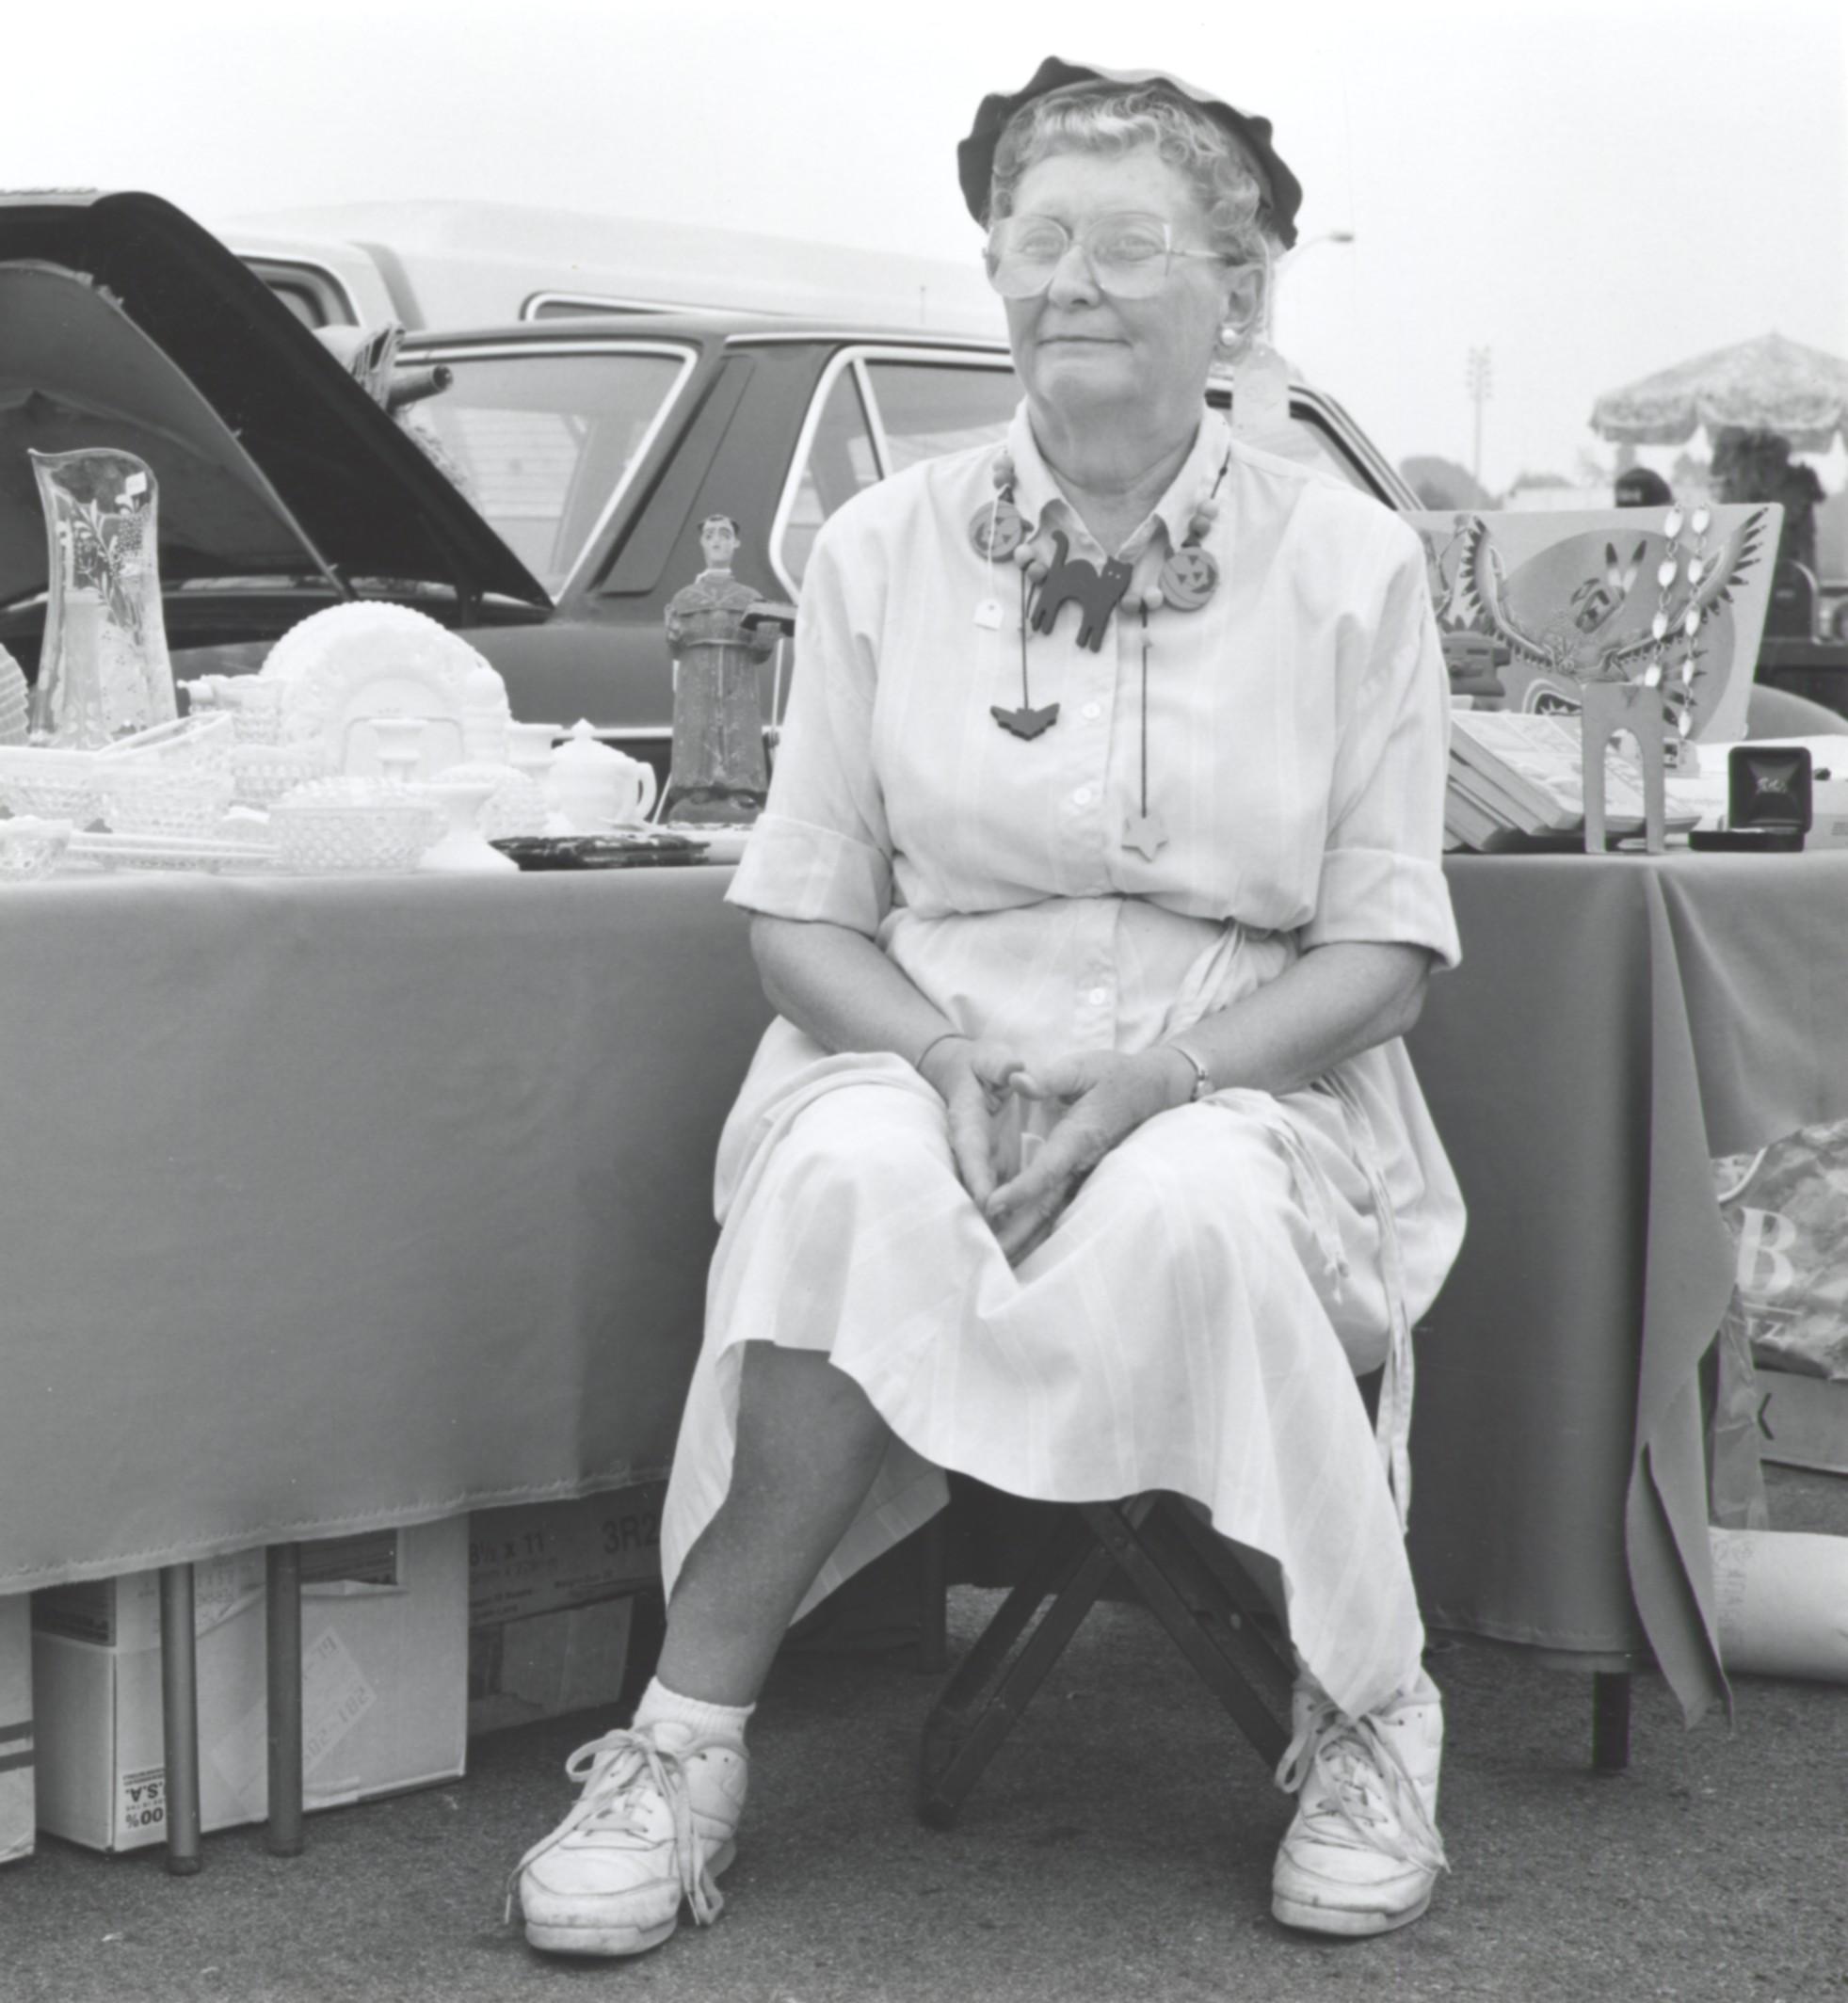 Jeannie Wearing Minnie Pearl Hat - Pasadena CA 1993